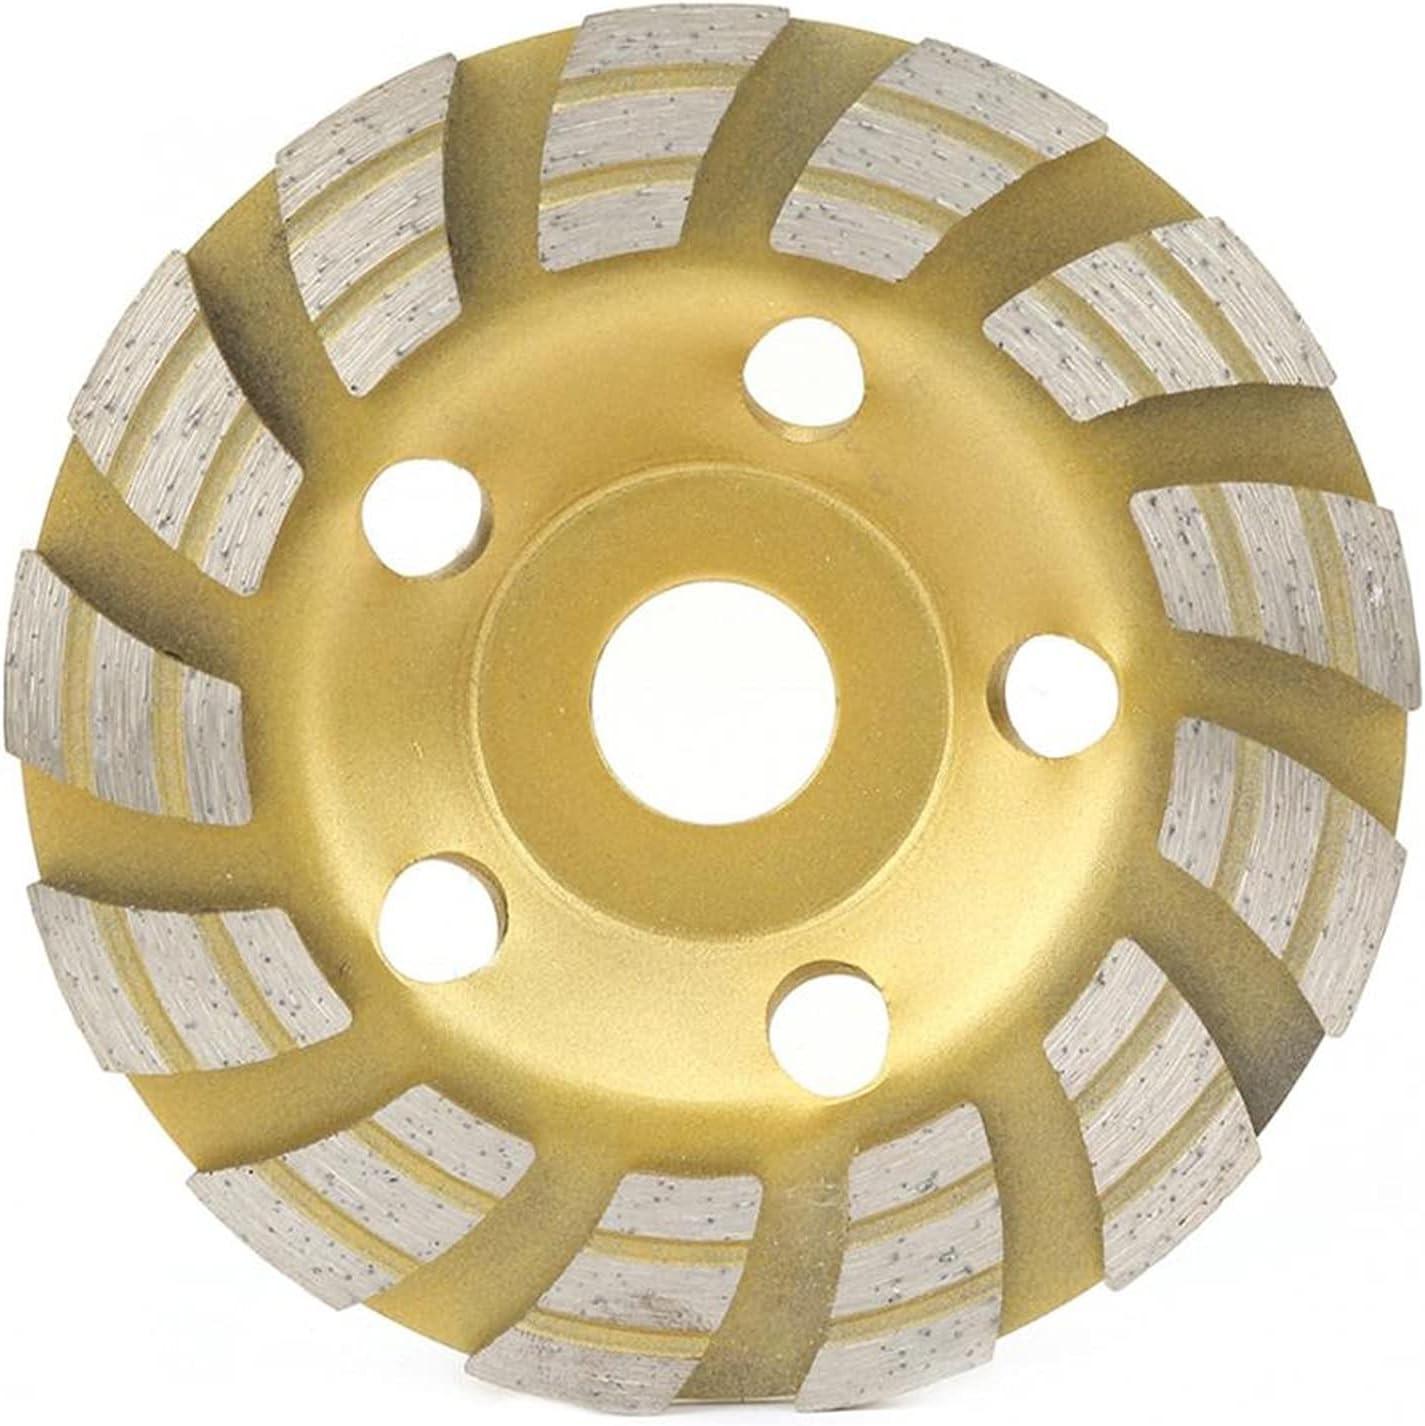 Cutting wheele 12522.2mm Diamond Inexpensive Quality inspection Segment Grinding Cup Cutt Wheel